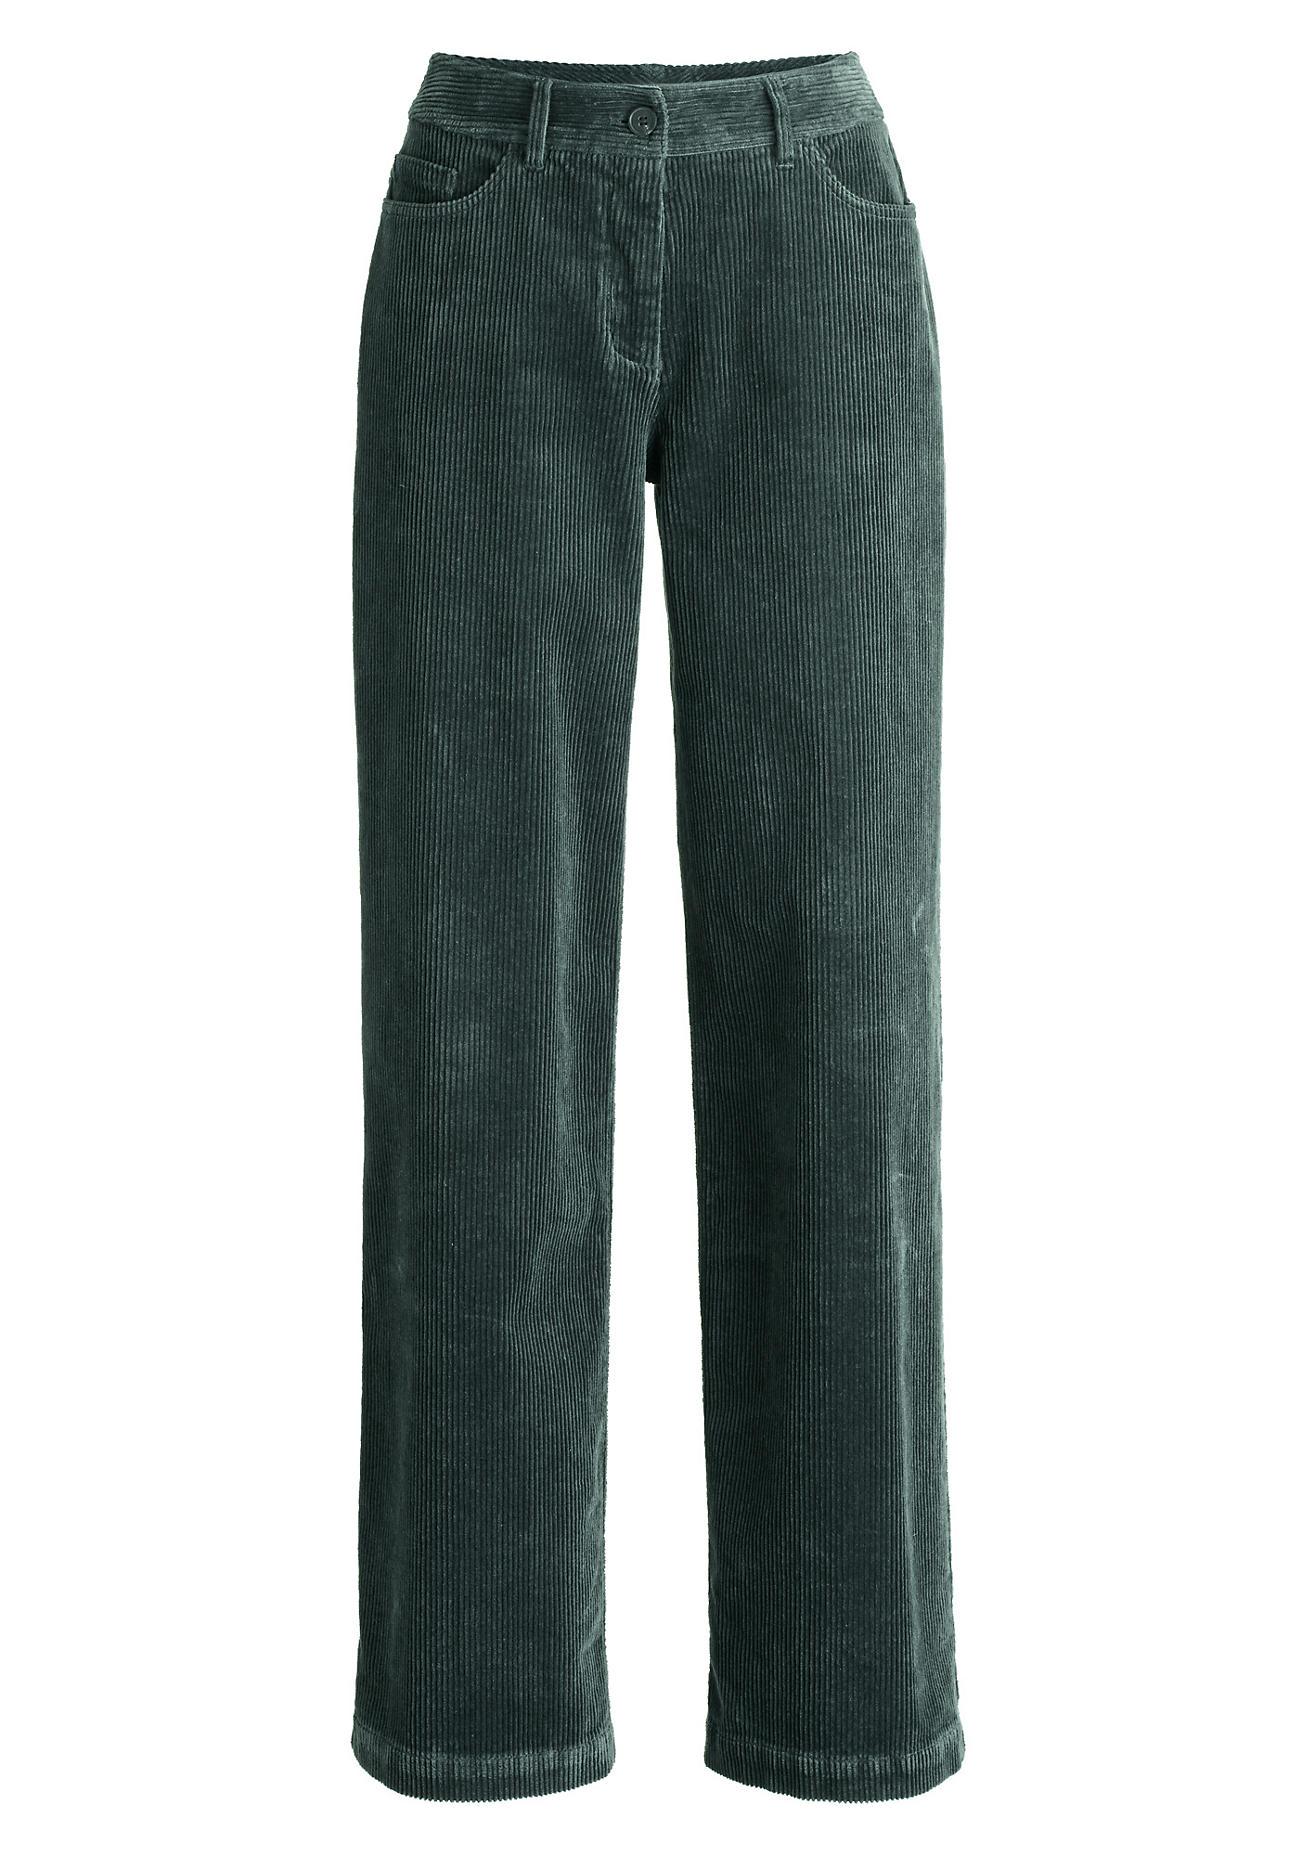 Hosen - hessnatur Damen Cord Hose aus Bio Baumwolle – grün –  - Onlineshop Hessnatur